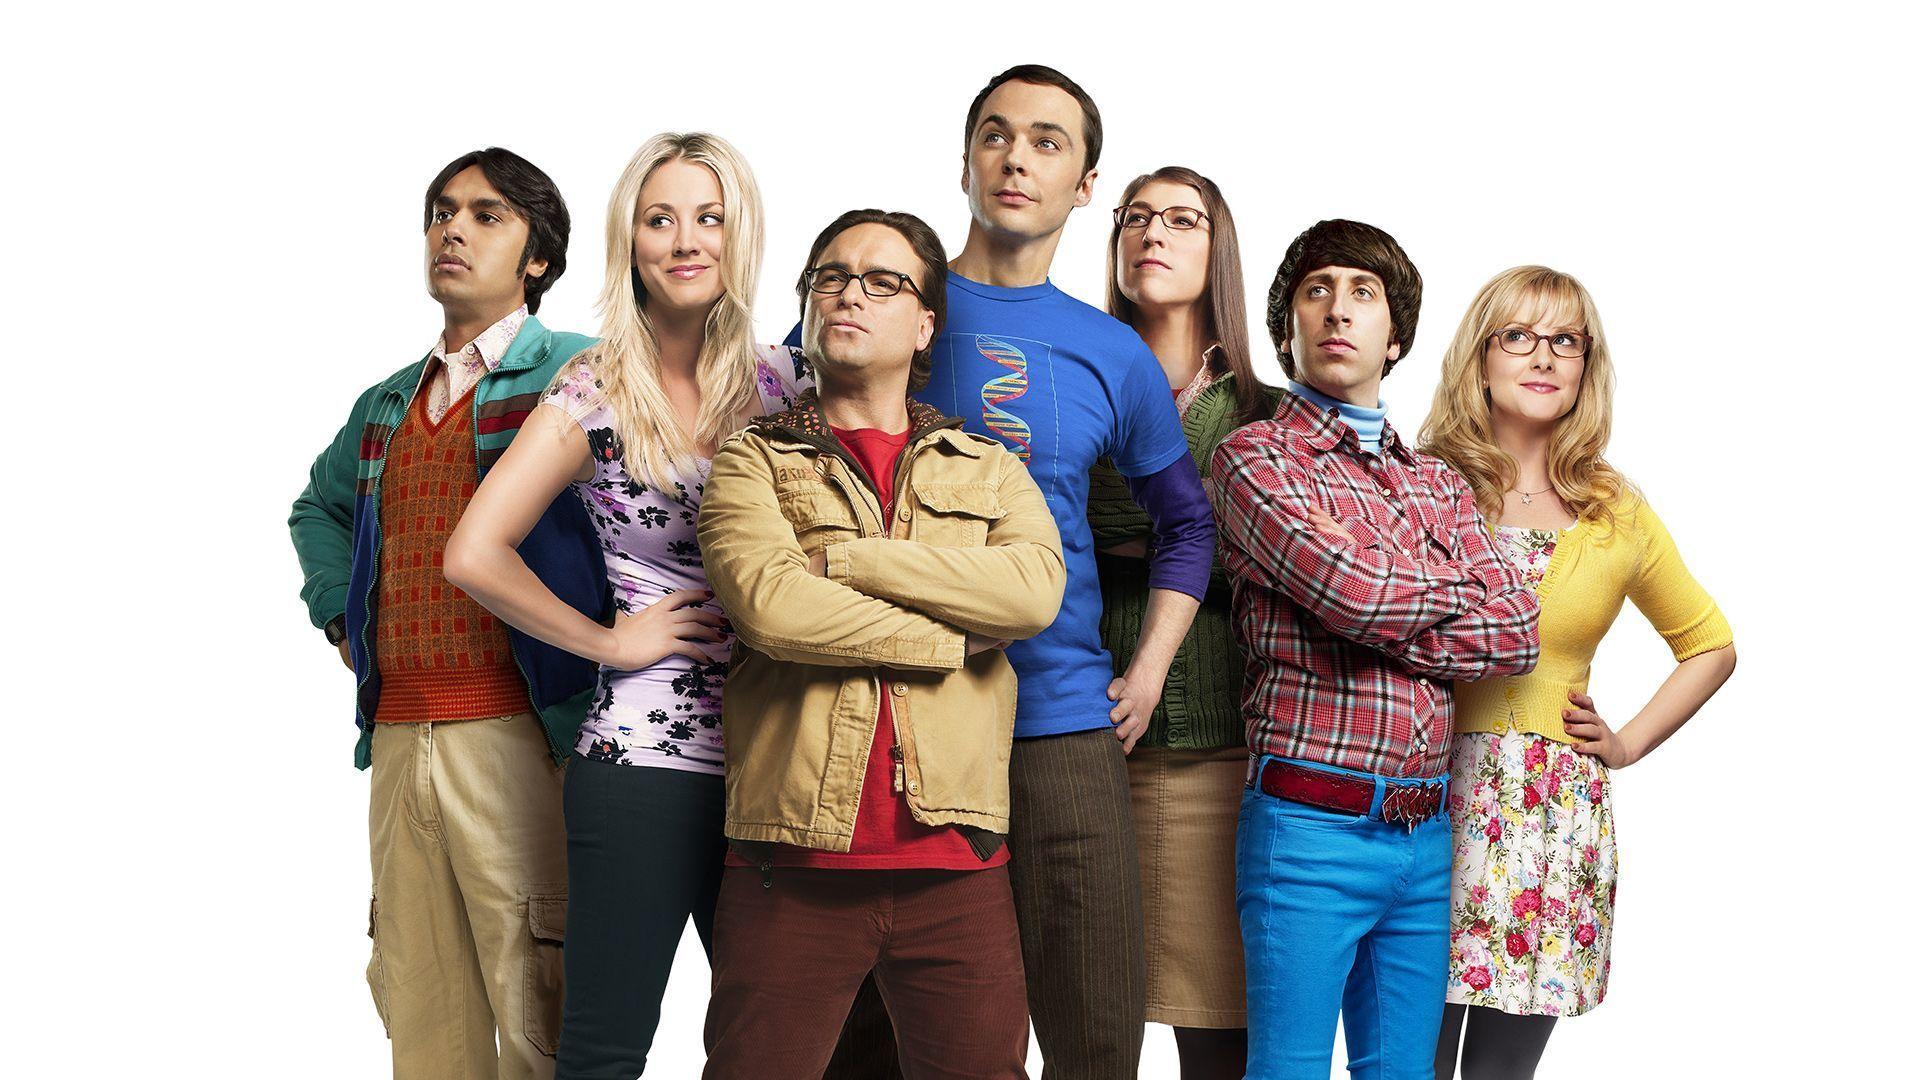 Big bang theory S08e06 1080